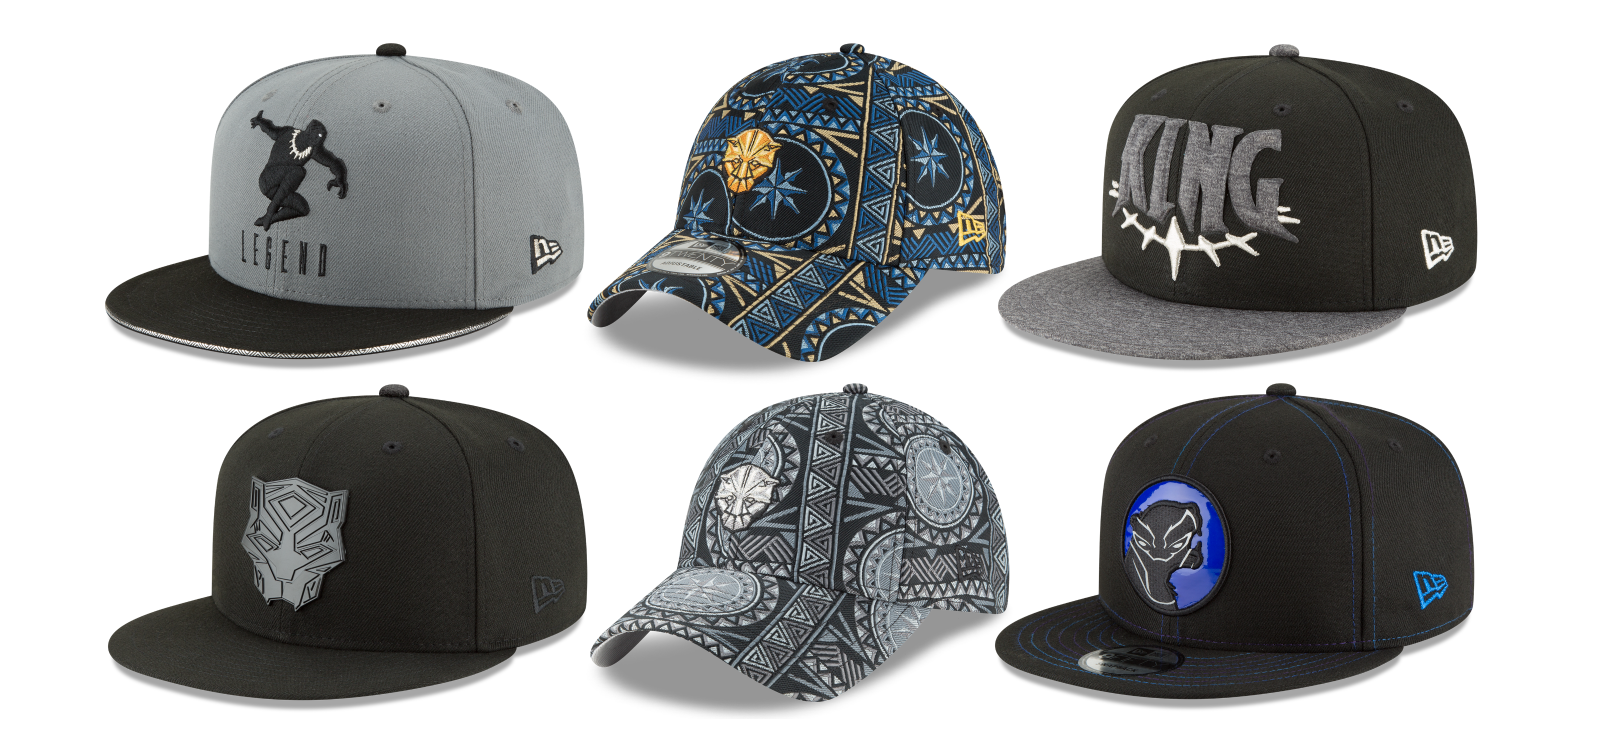 100% authentic a5b71 46e5d New Era Cap Unveils Its Black Panther Movie Marvel Hat Collection!